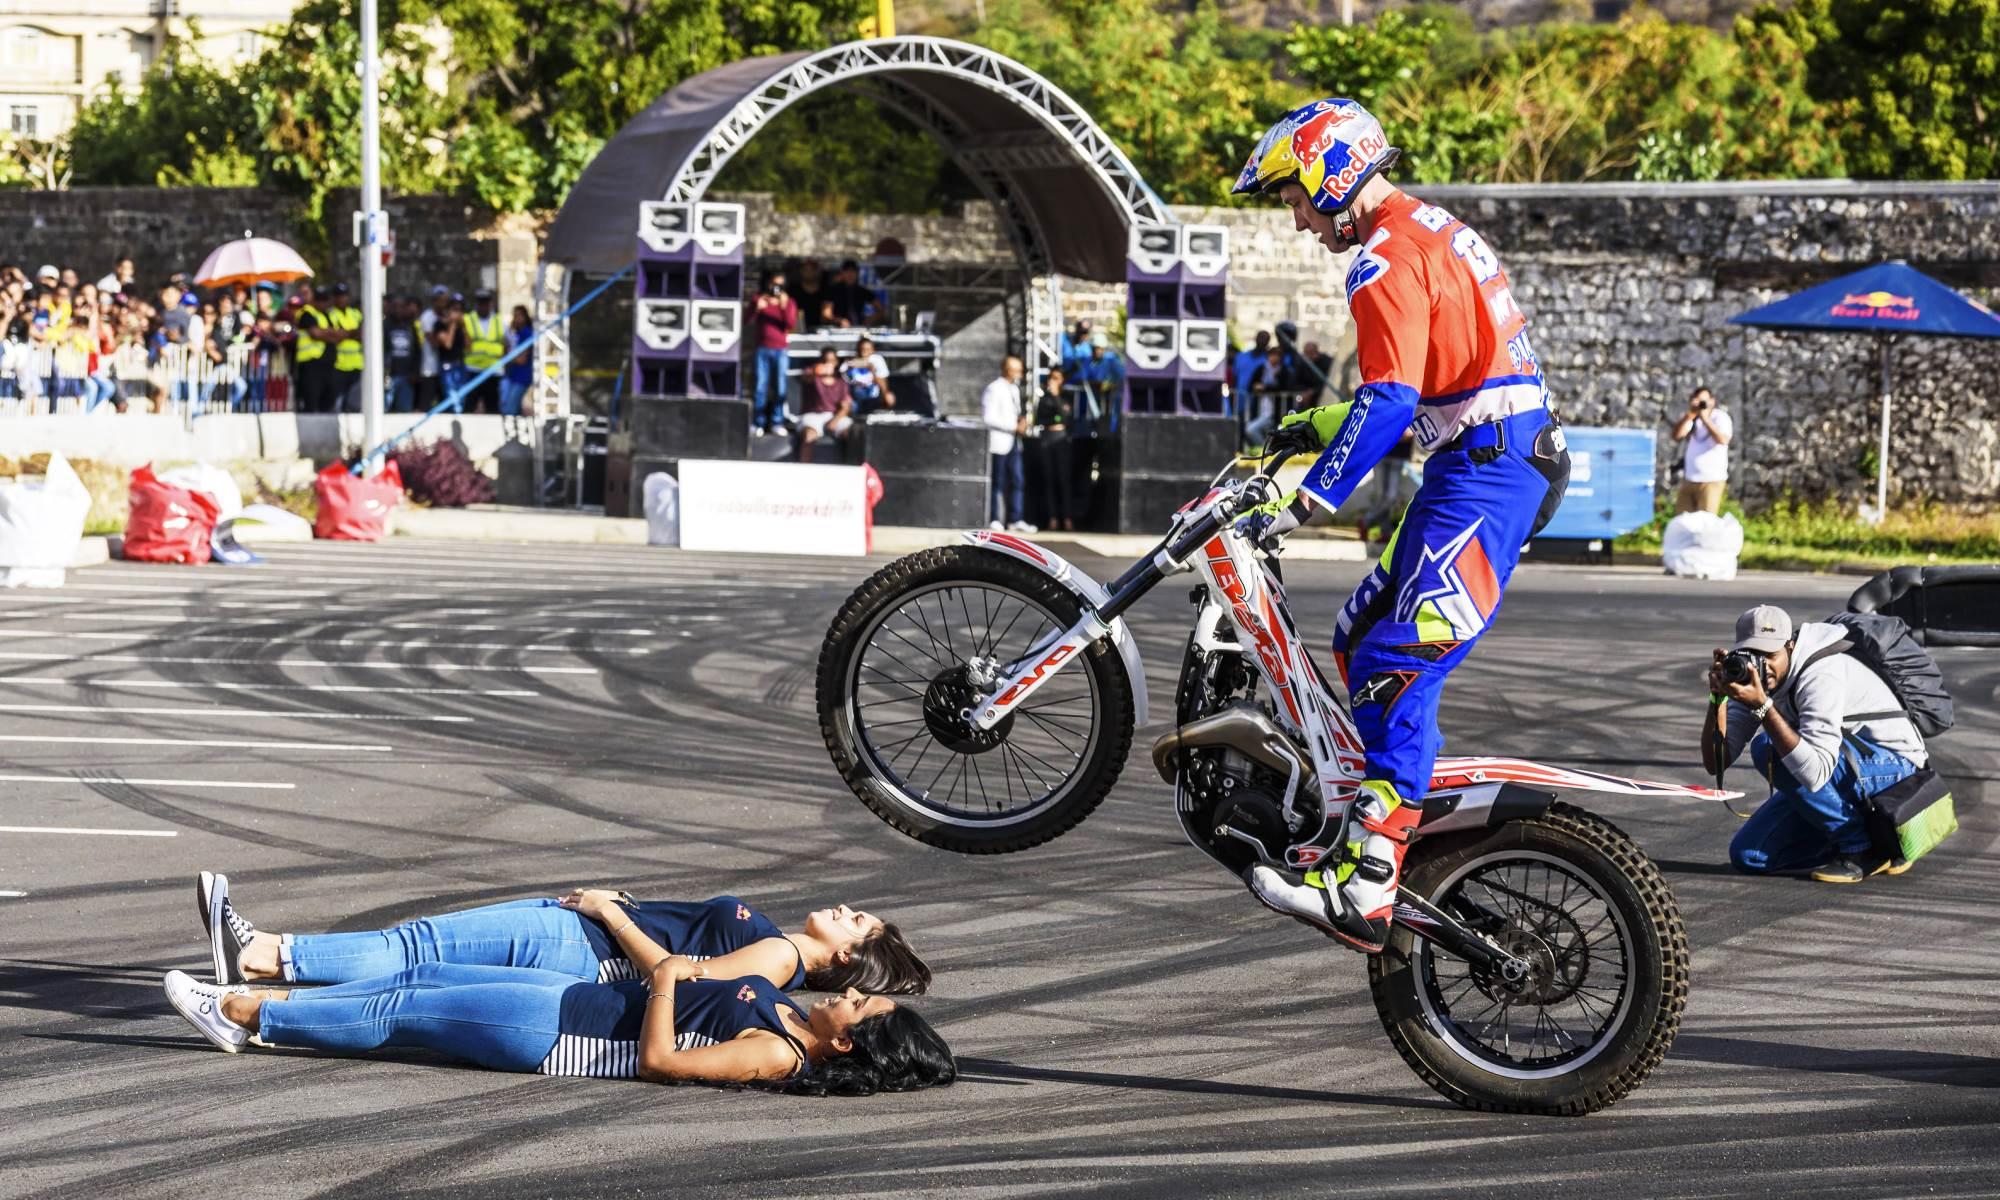 Cape Town F1 experience rider Brian Capper